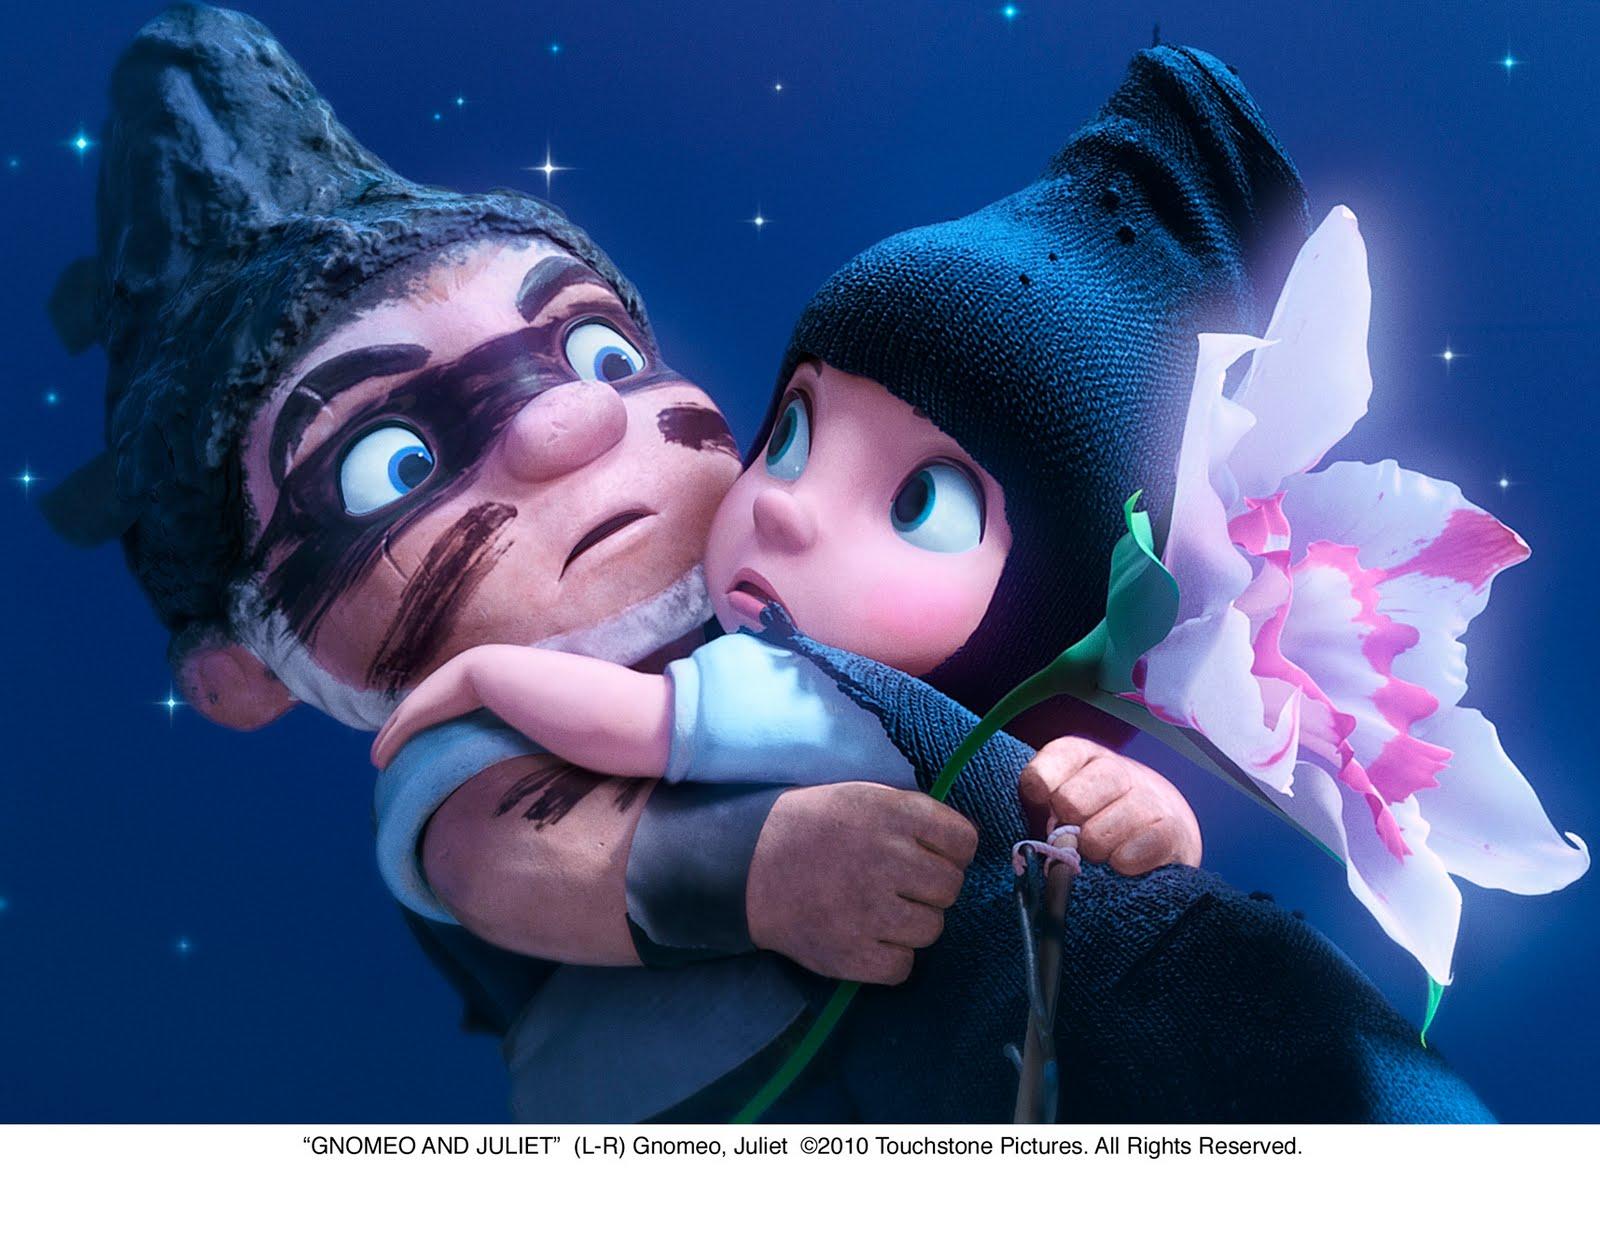 http://3.bp.blogspot.com/-fm6O_8vKV6w/TZawOtU84DI/AAAAAAAAW0k/z-UYyE5G8G4/s1600/Gnomeo_02.jpg